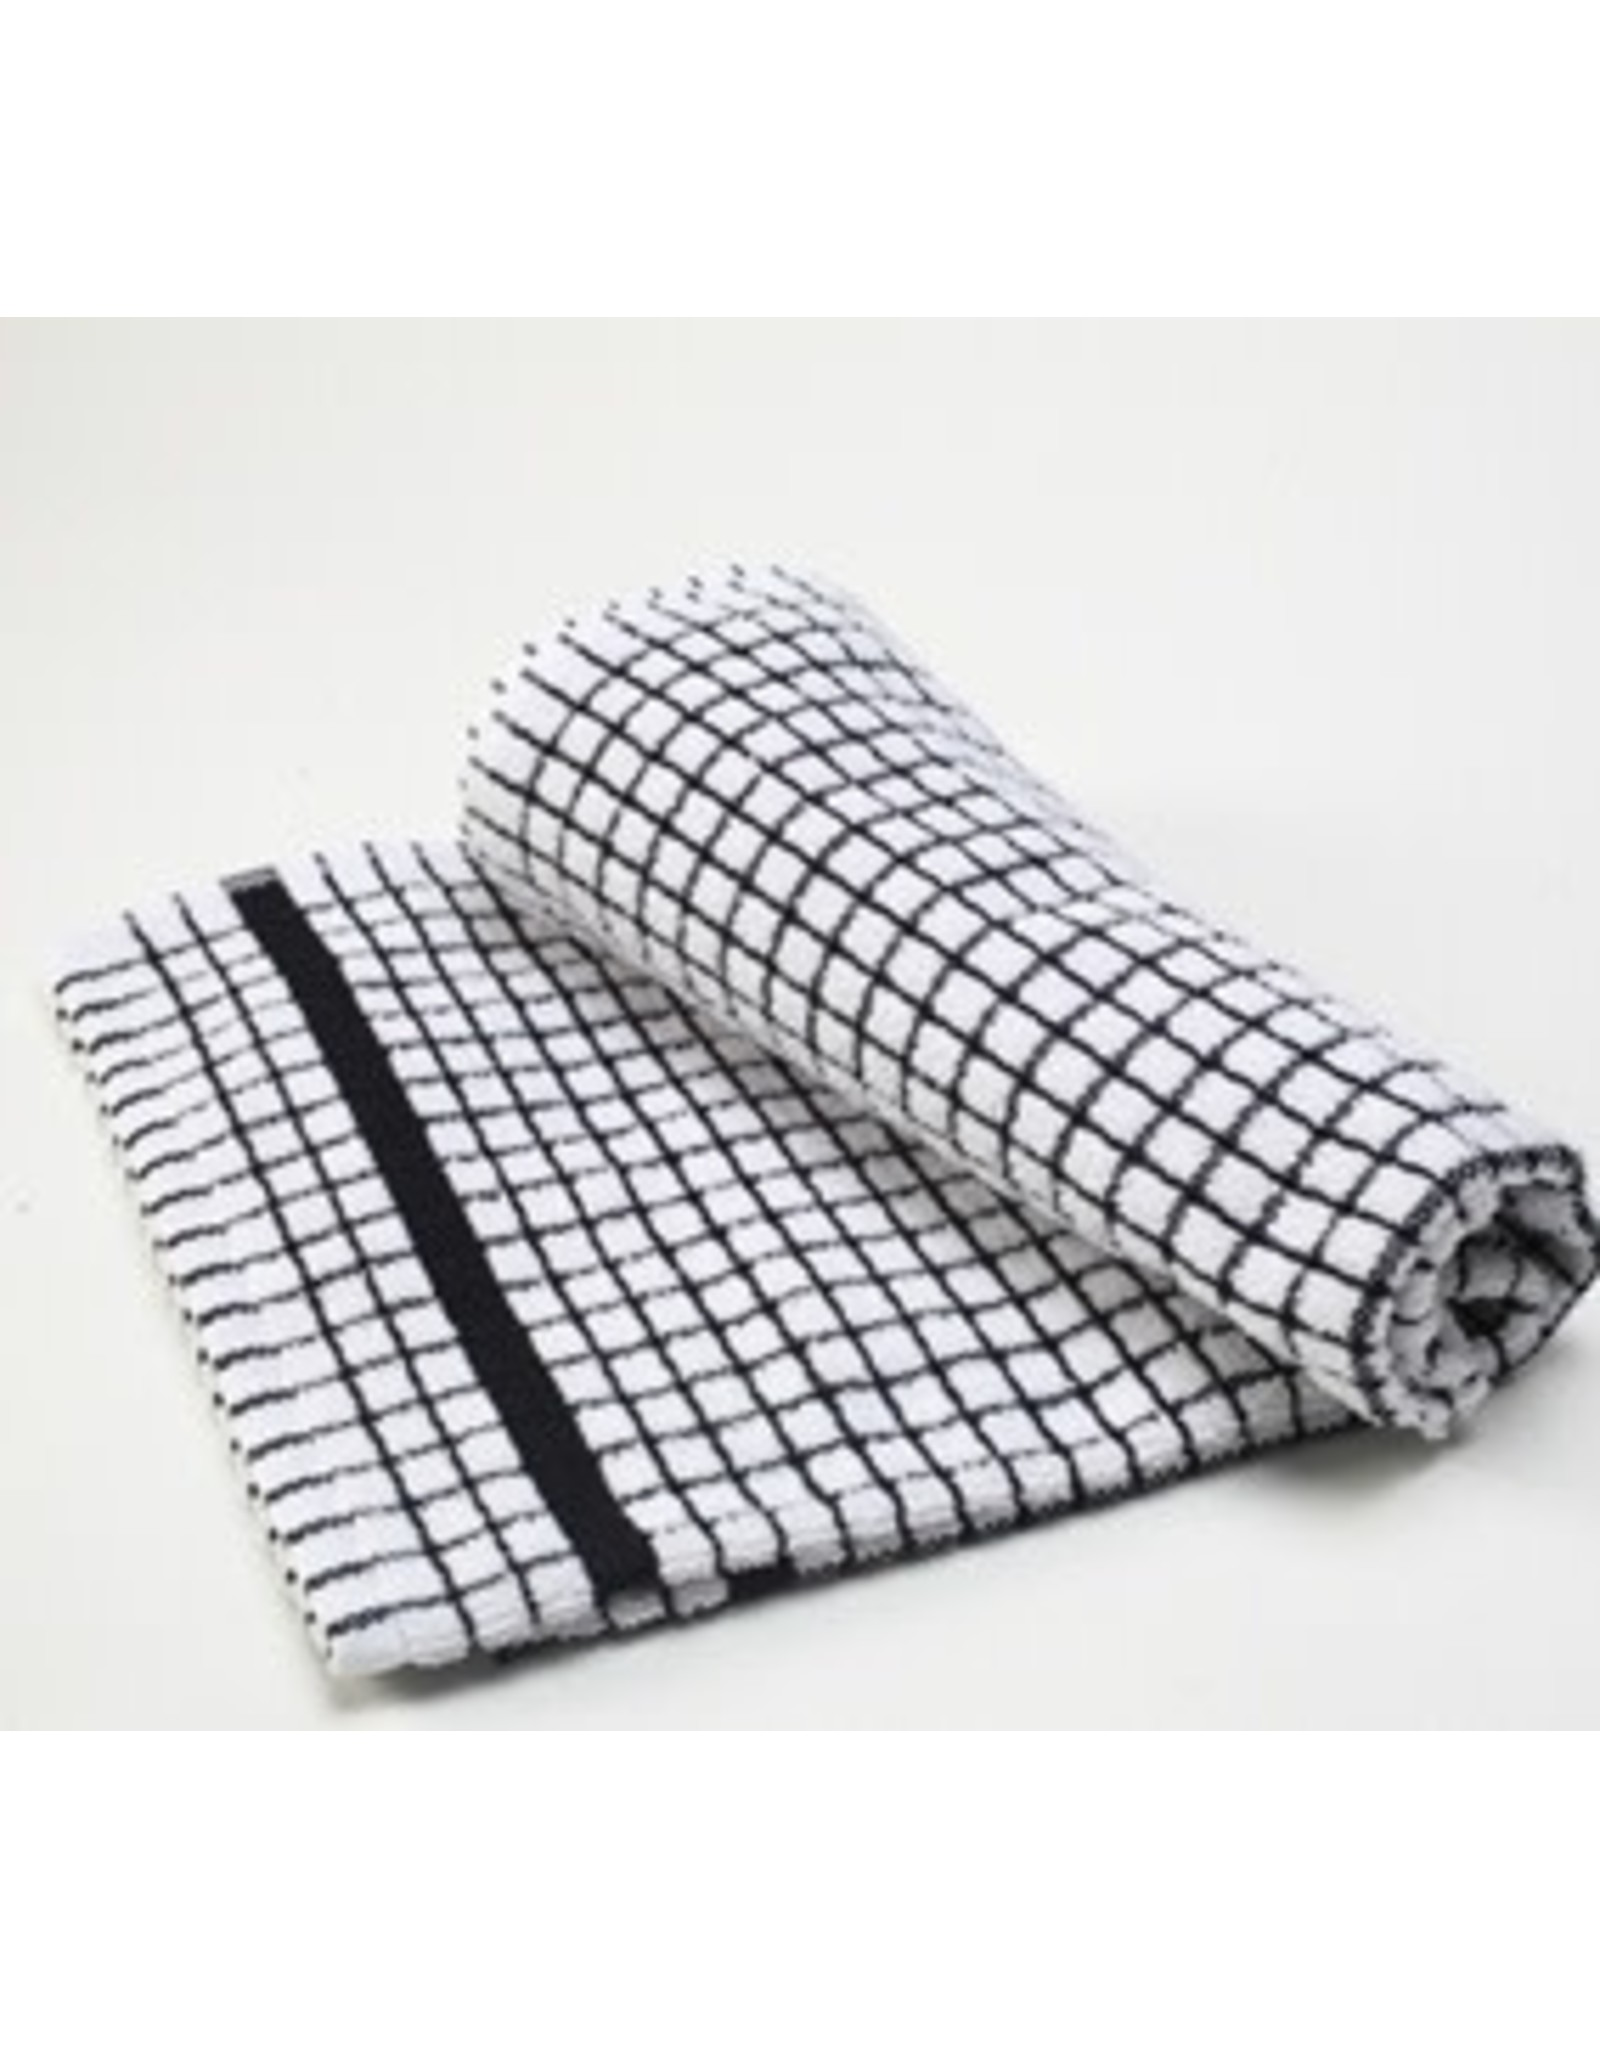 Black Checkered Dish Towel